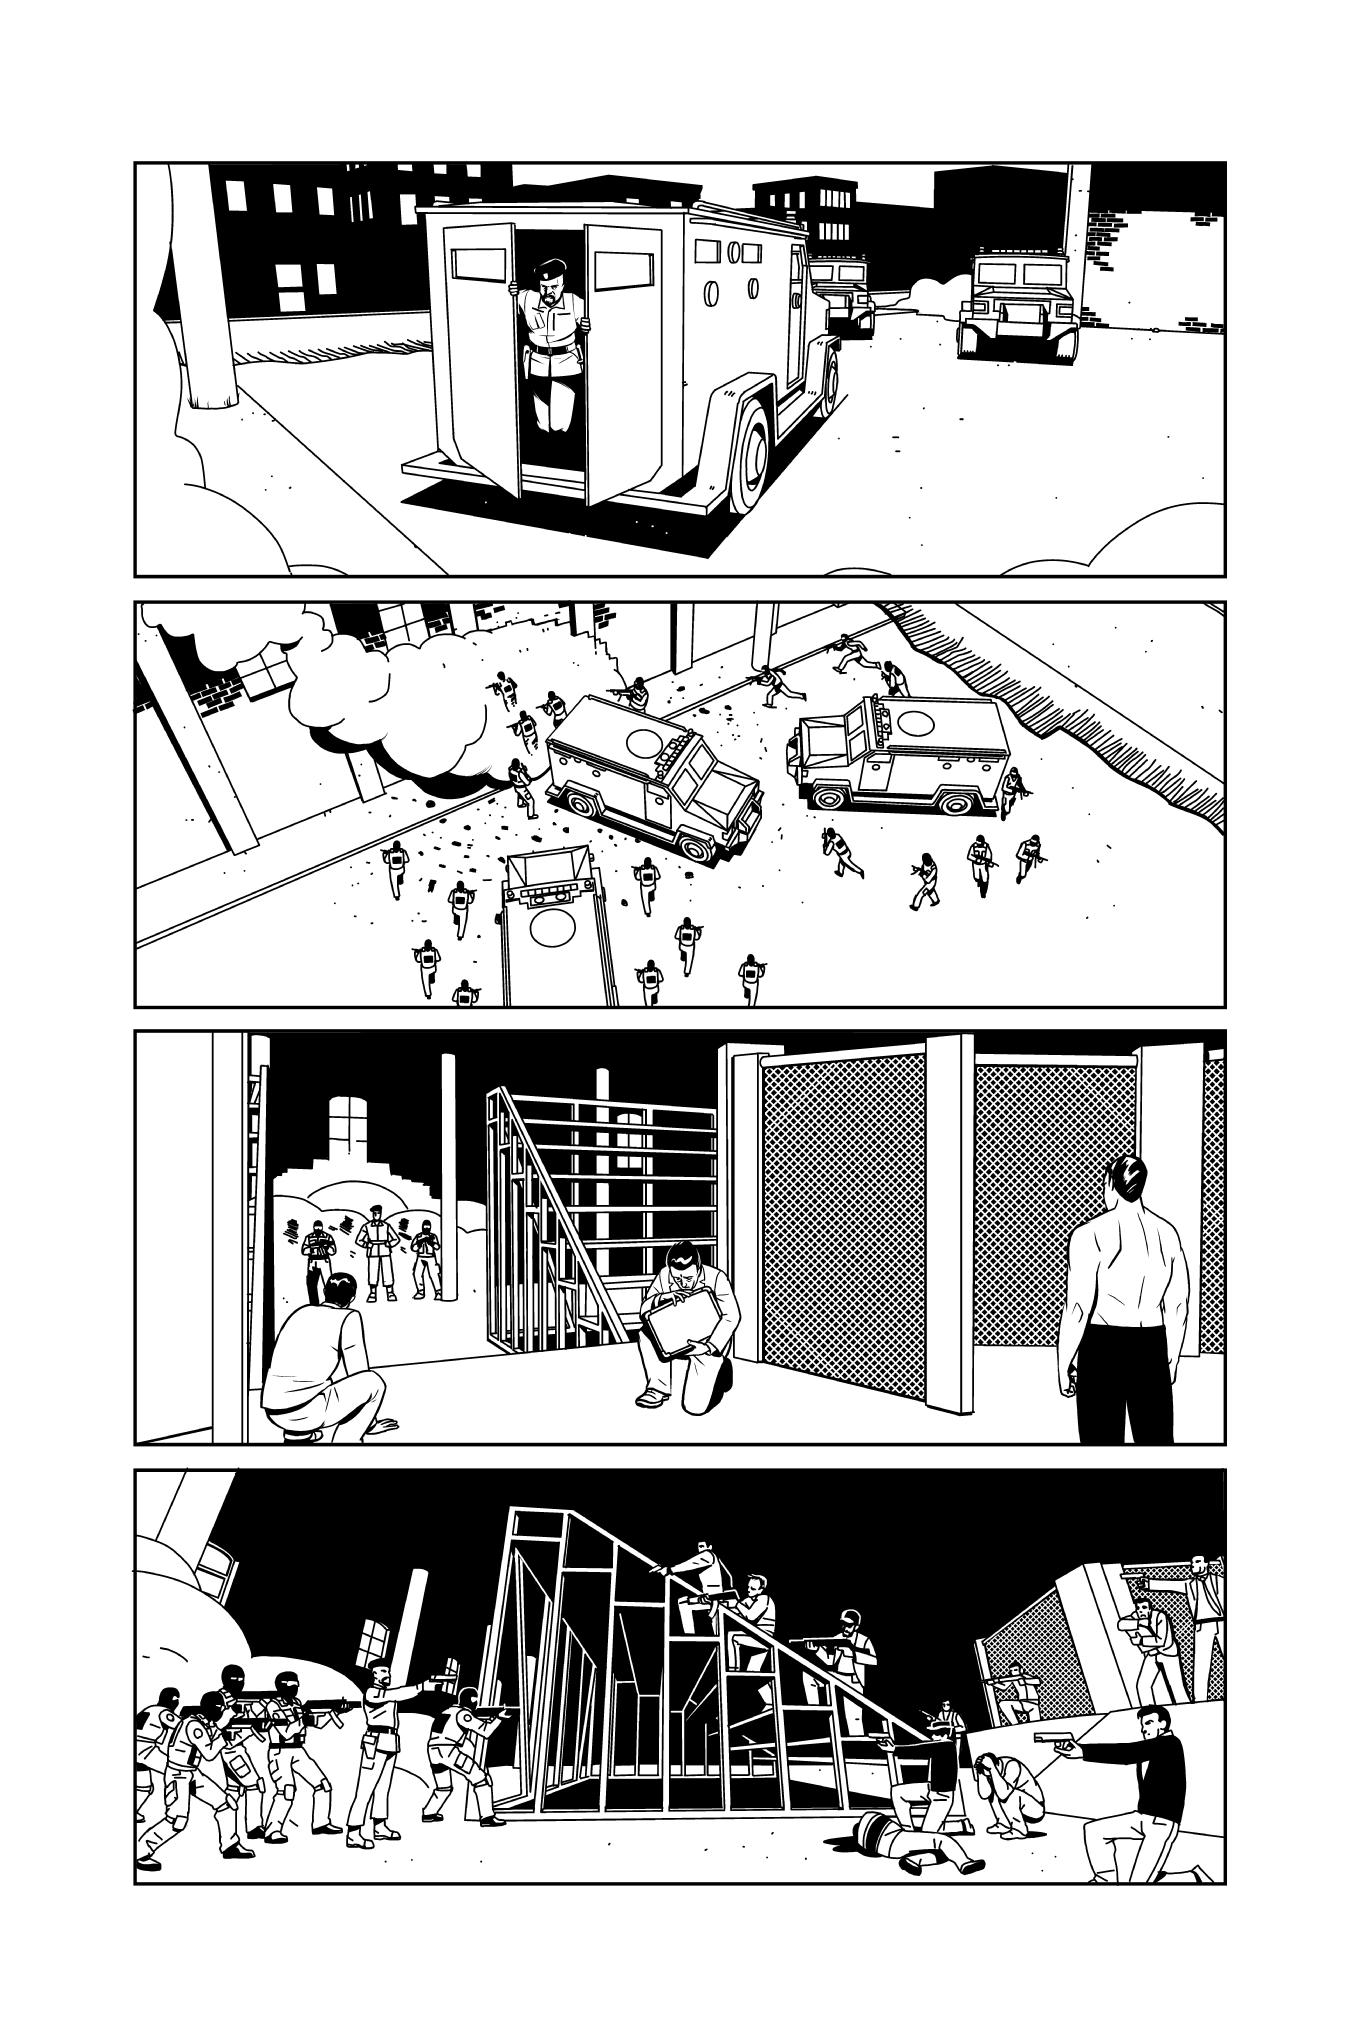 f1rsthero_vol2.4_page_3.jpg